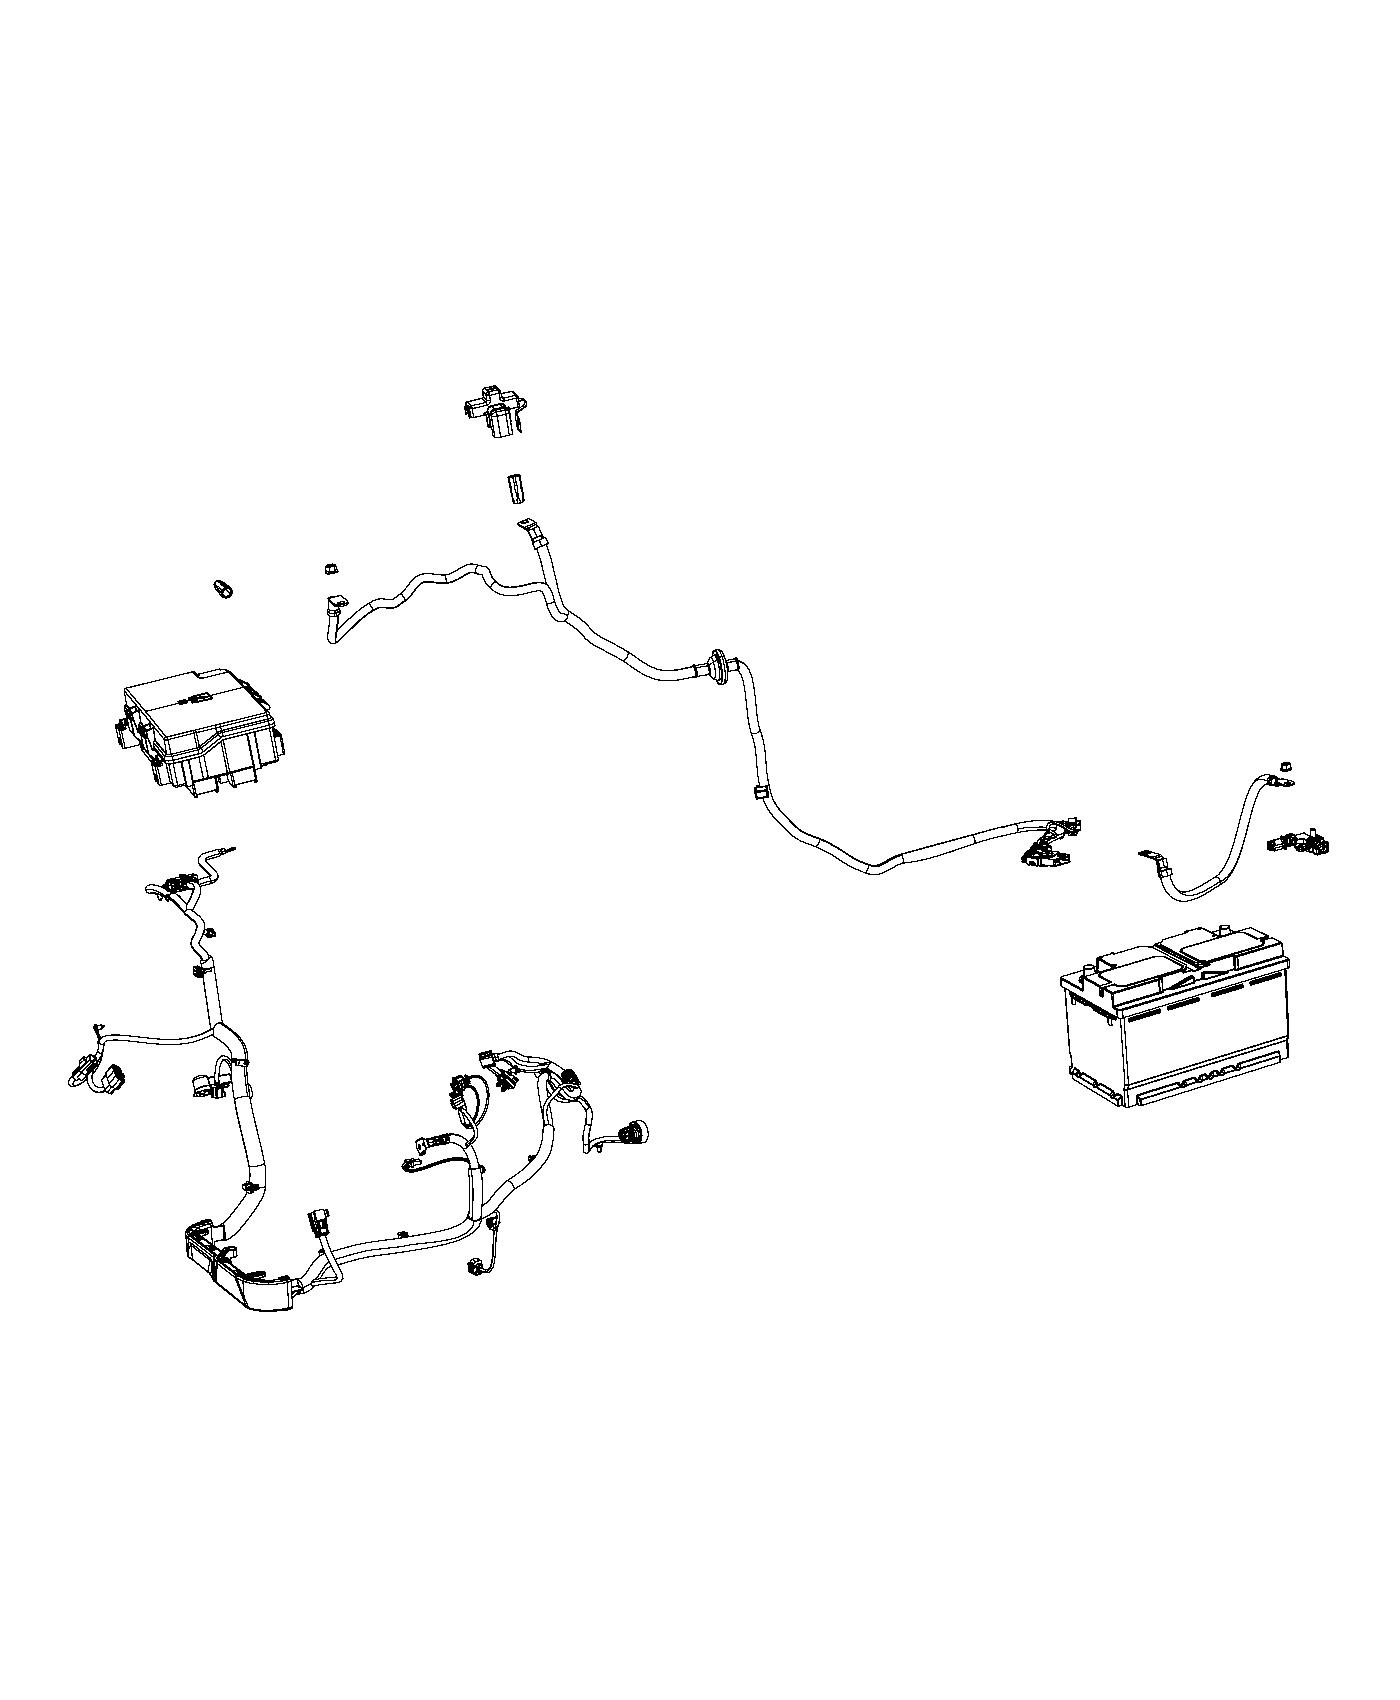 Jeep Grand Cherokee Wiring. Alternator starter power